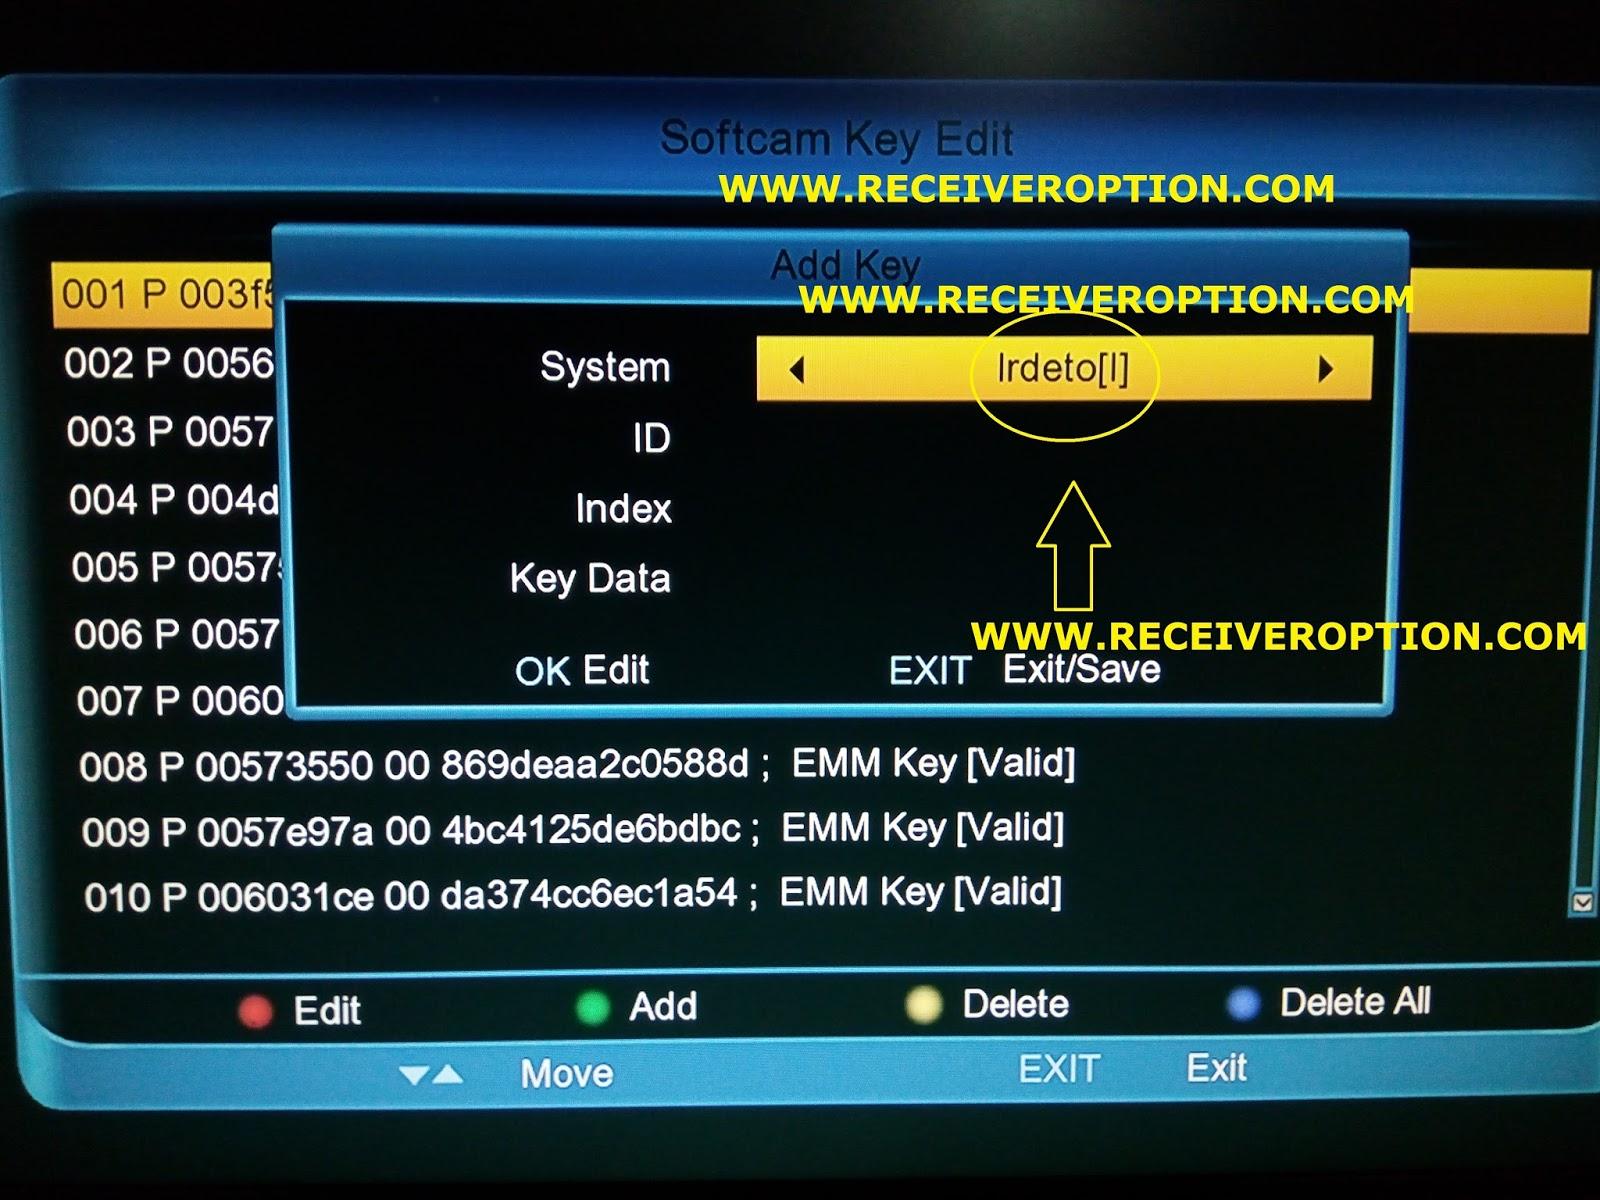 OPENBOX A7G HD RECEIVER POWERVU KEY OPTION - HOW TO ENTER